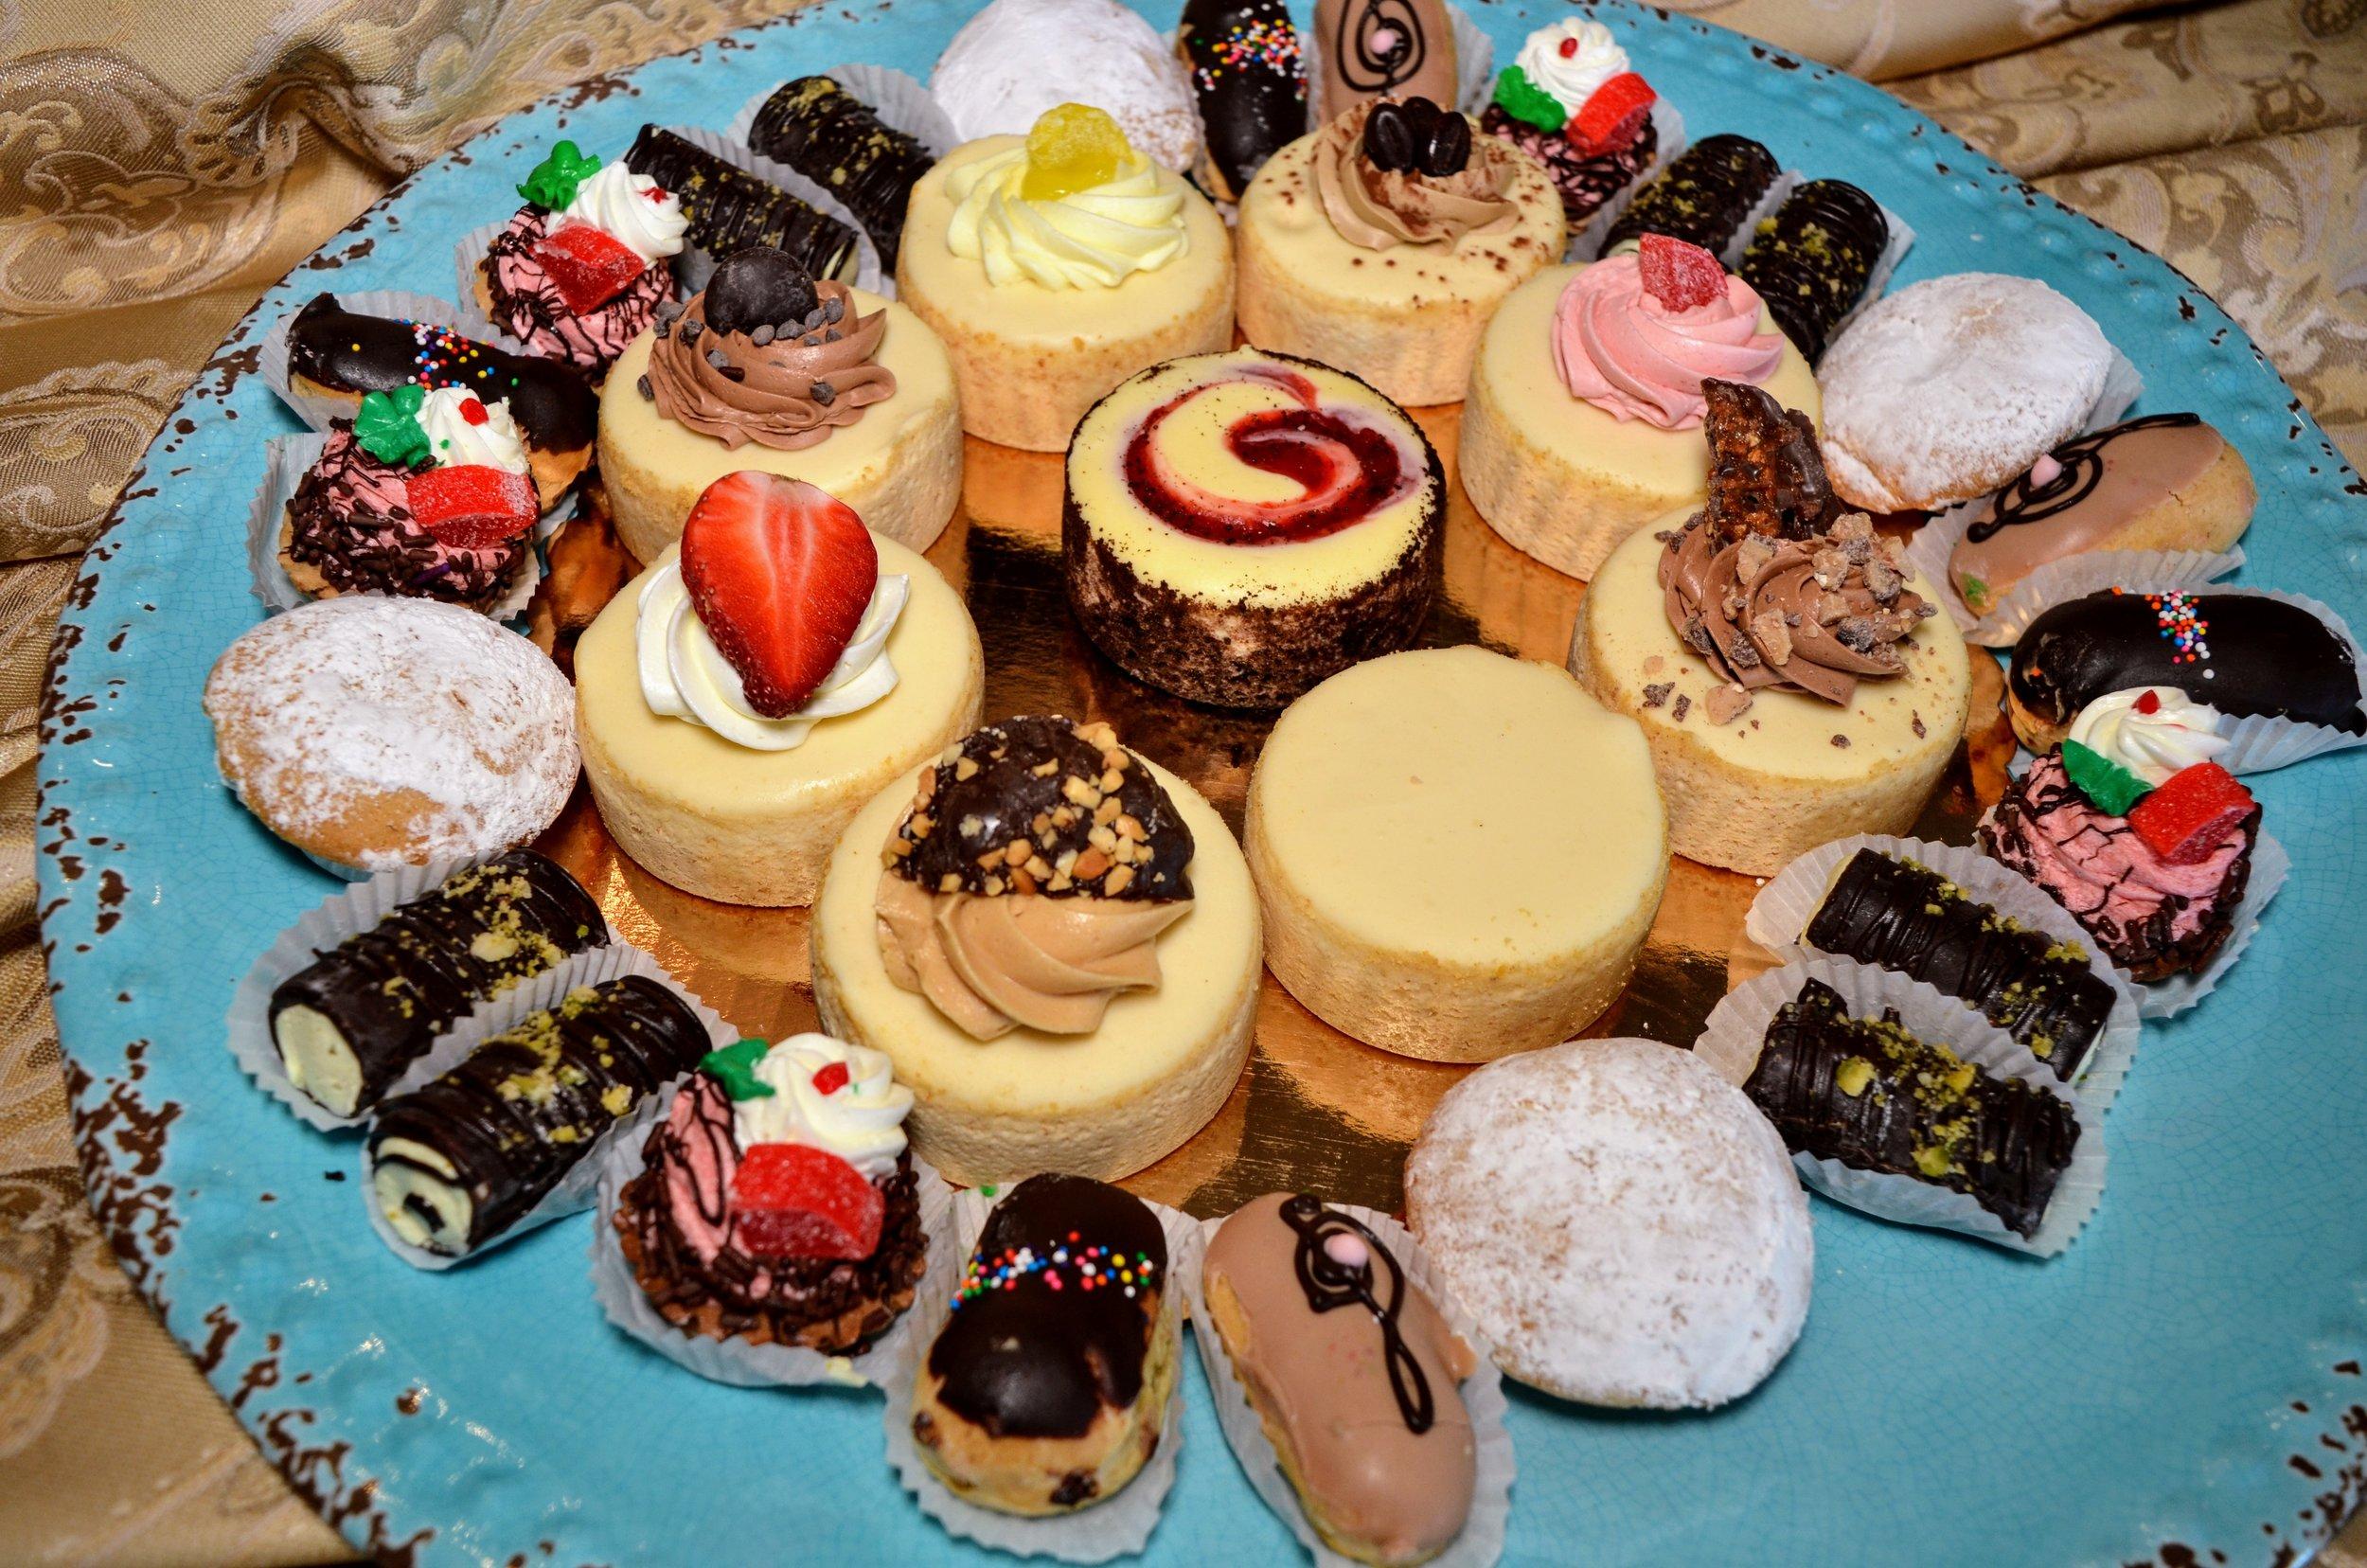 Pastries-Cheesecakes.jpg